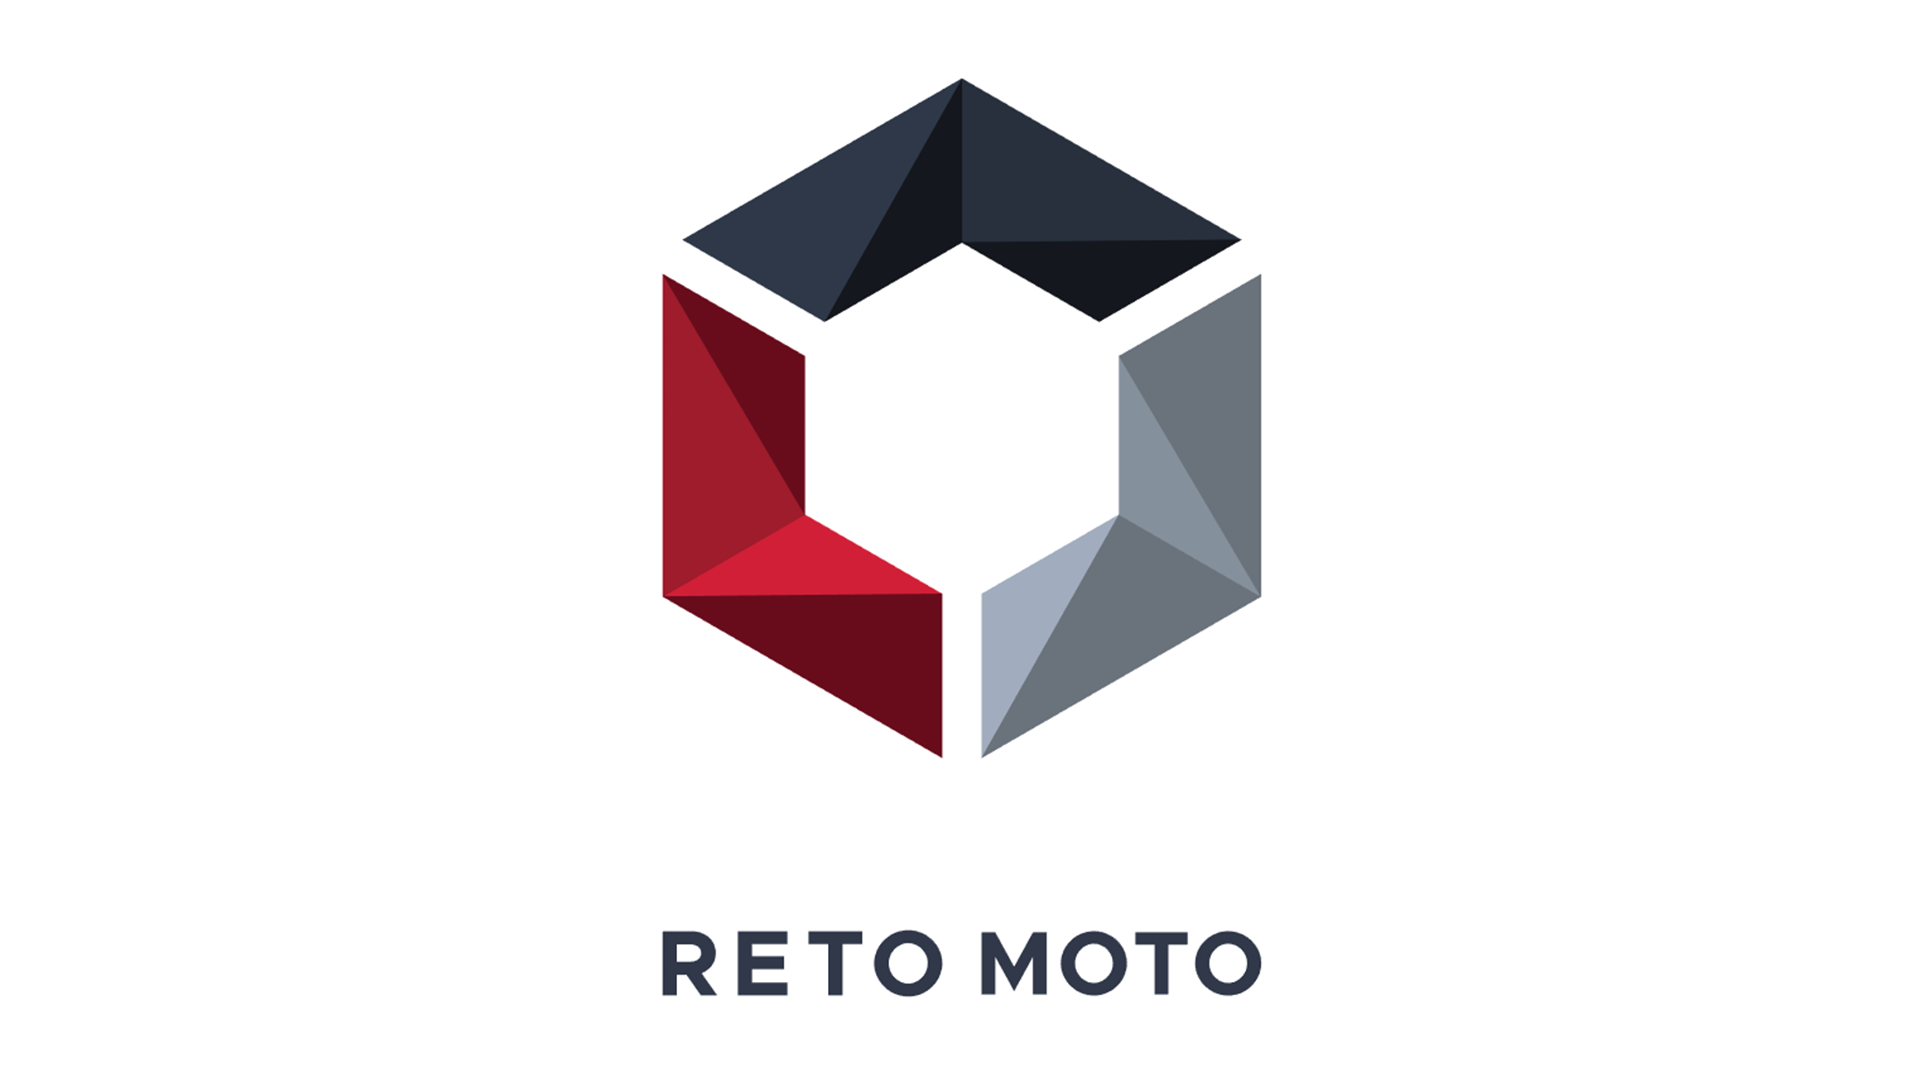 RETO MOTO   RETO MOTO is a game studio based in Copenhagen, Denmark. RETO MOTO develops and operates the WW2 game Heroes & Generals.